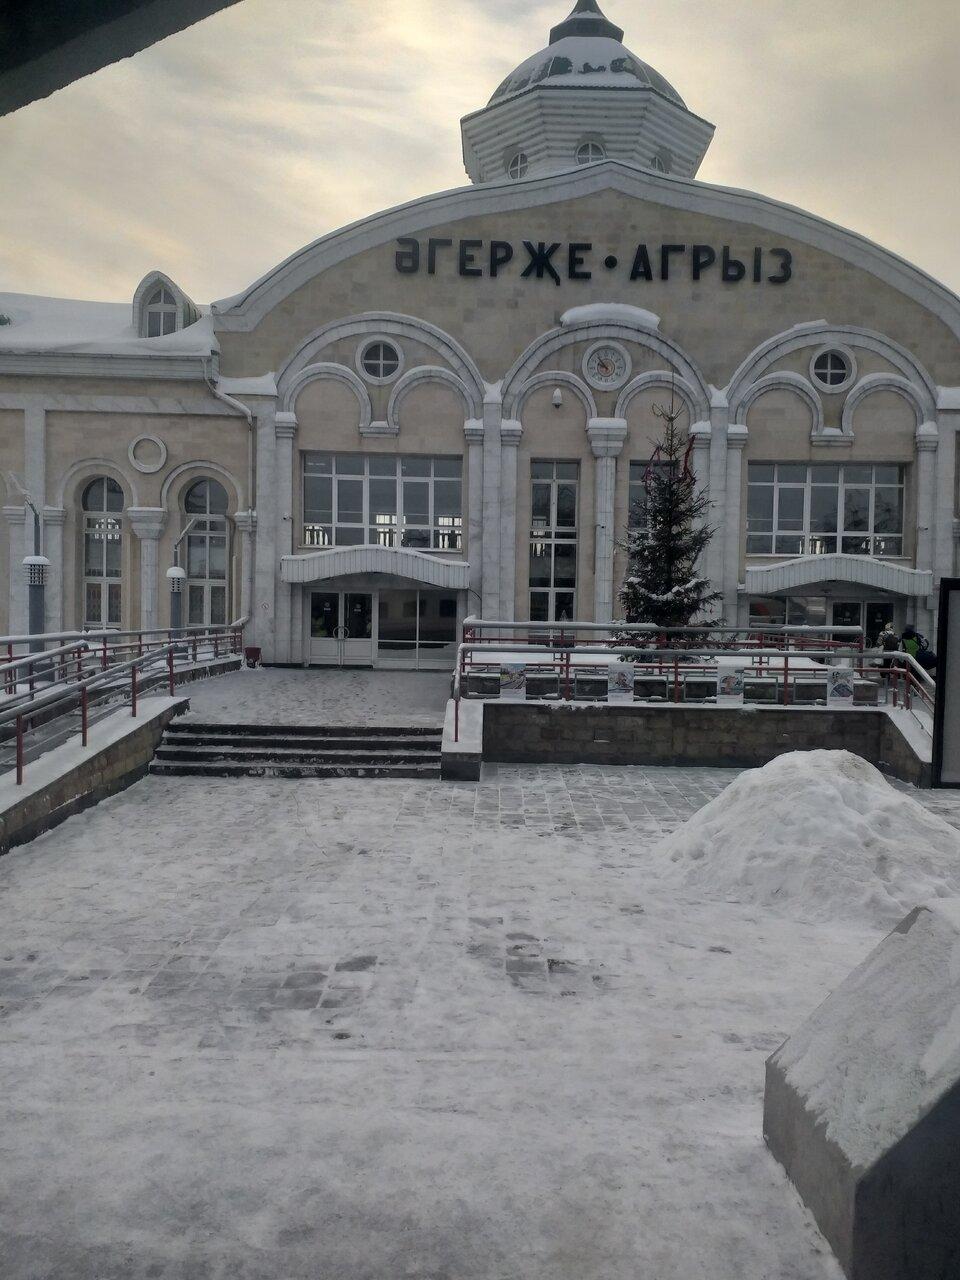 татарстан агрыз фото автор